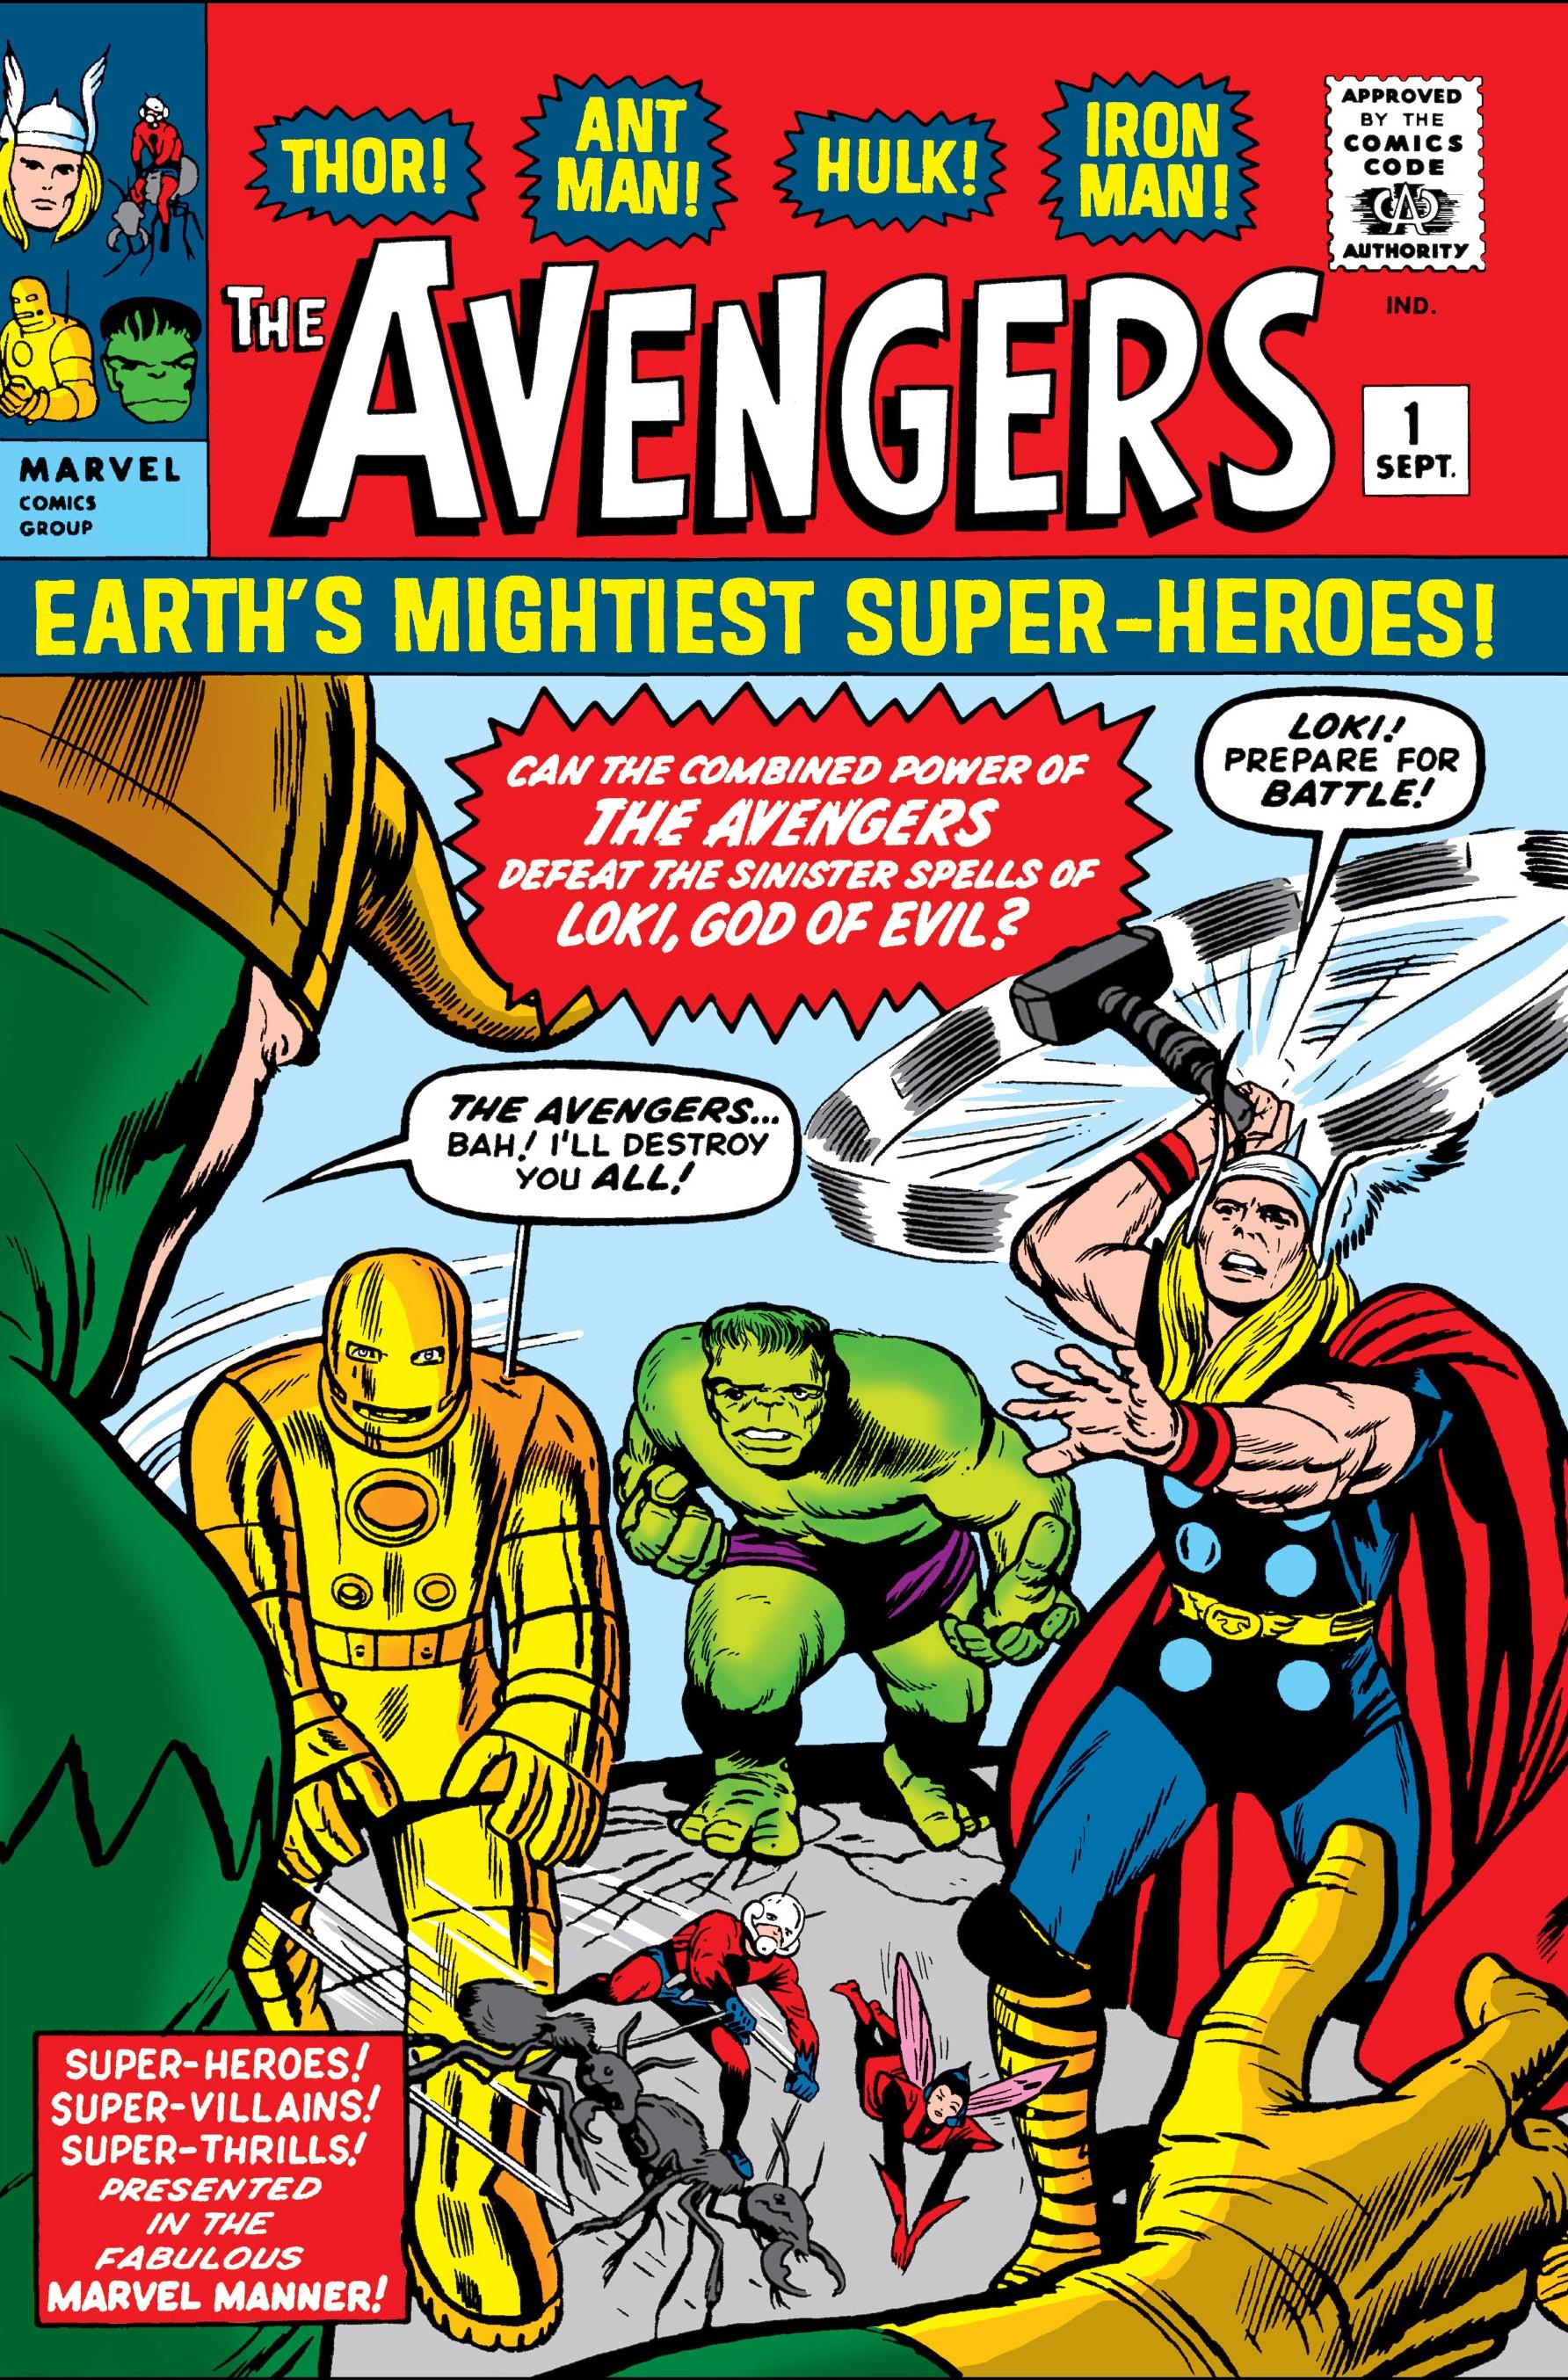 http://img4.wikia.nocookie.net/__cb20051102180359/marveldatabase/images/c/cc/Avengers_Vol_1_1.jpg